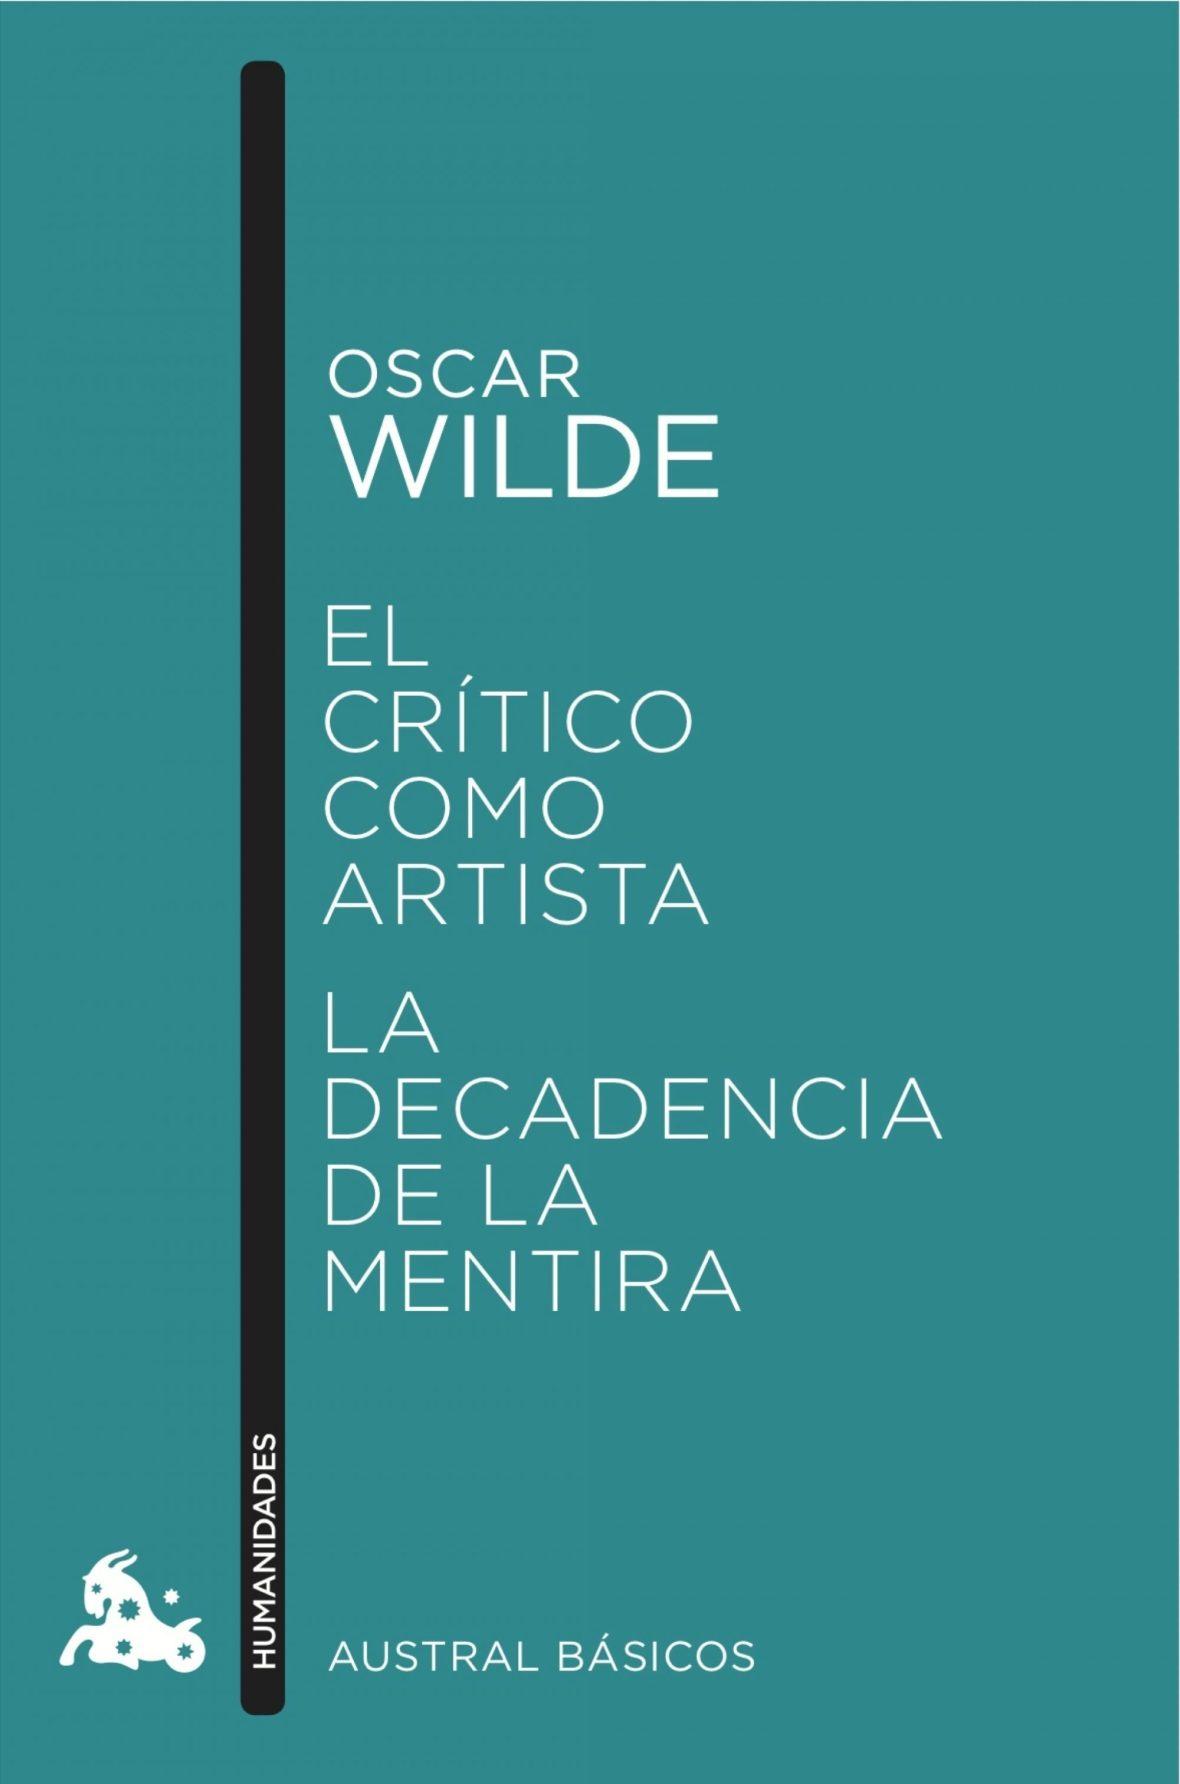 el critico como artista oscar wilde